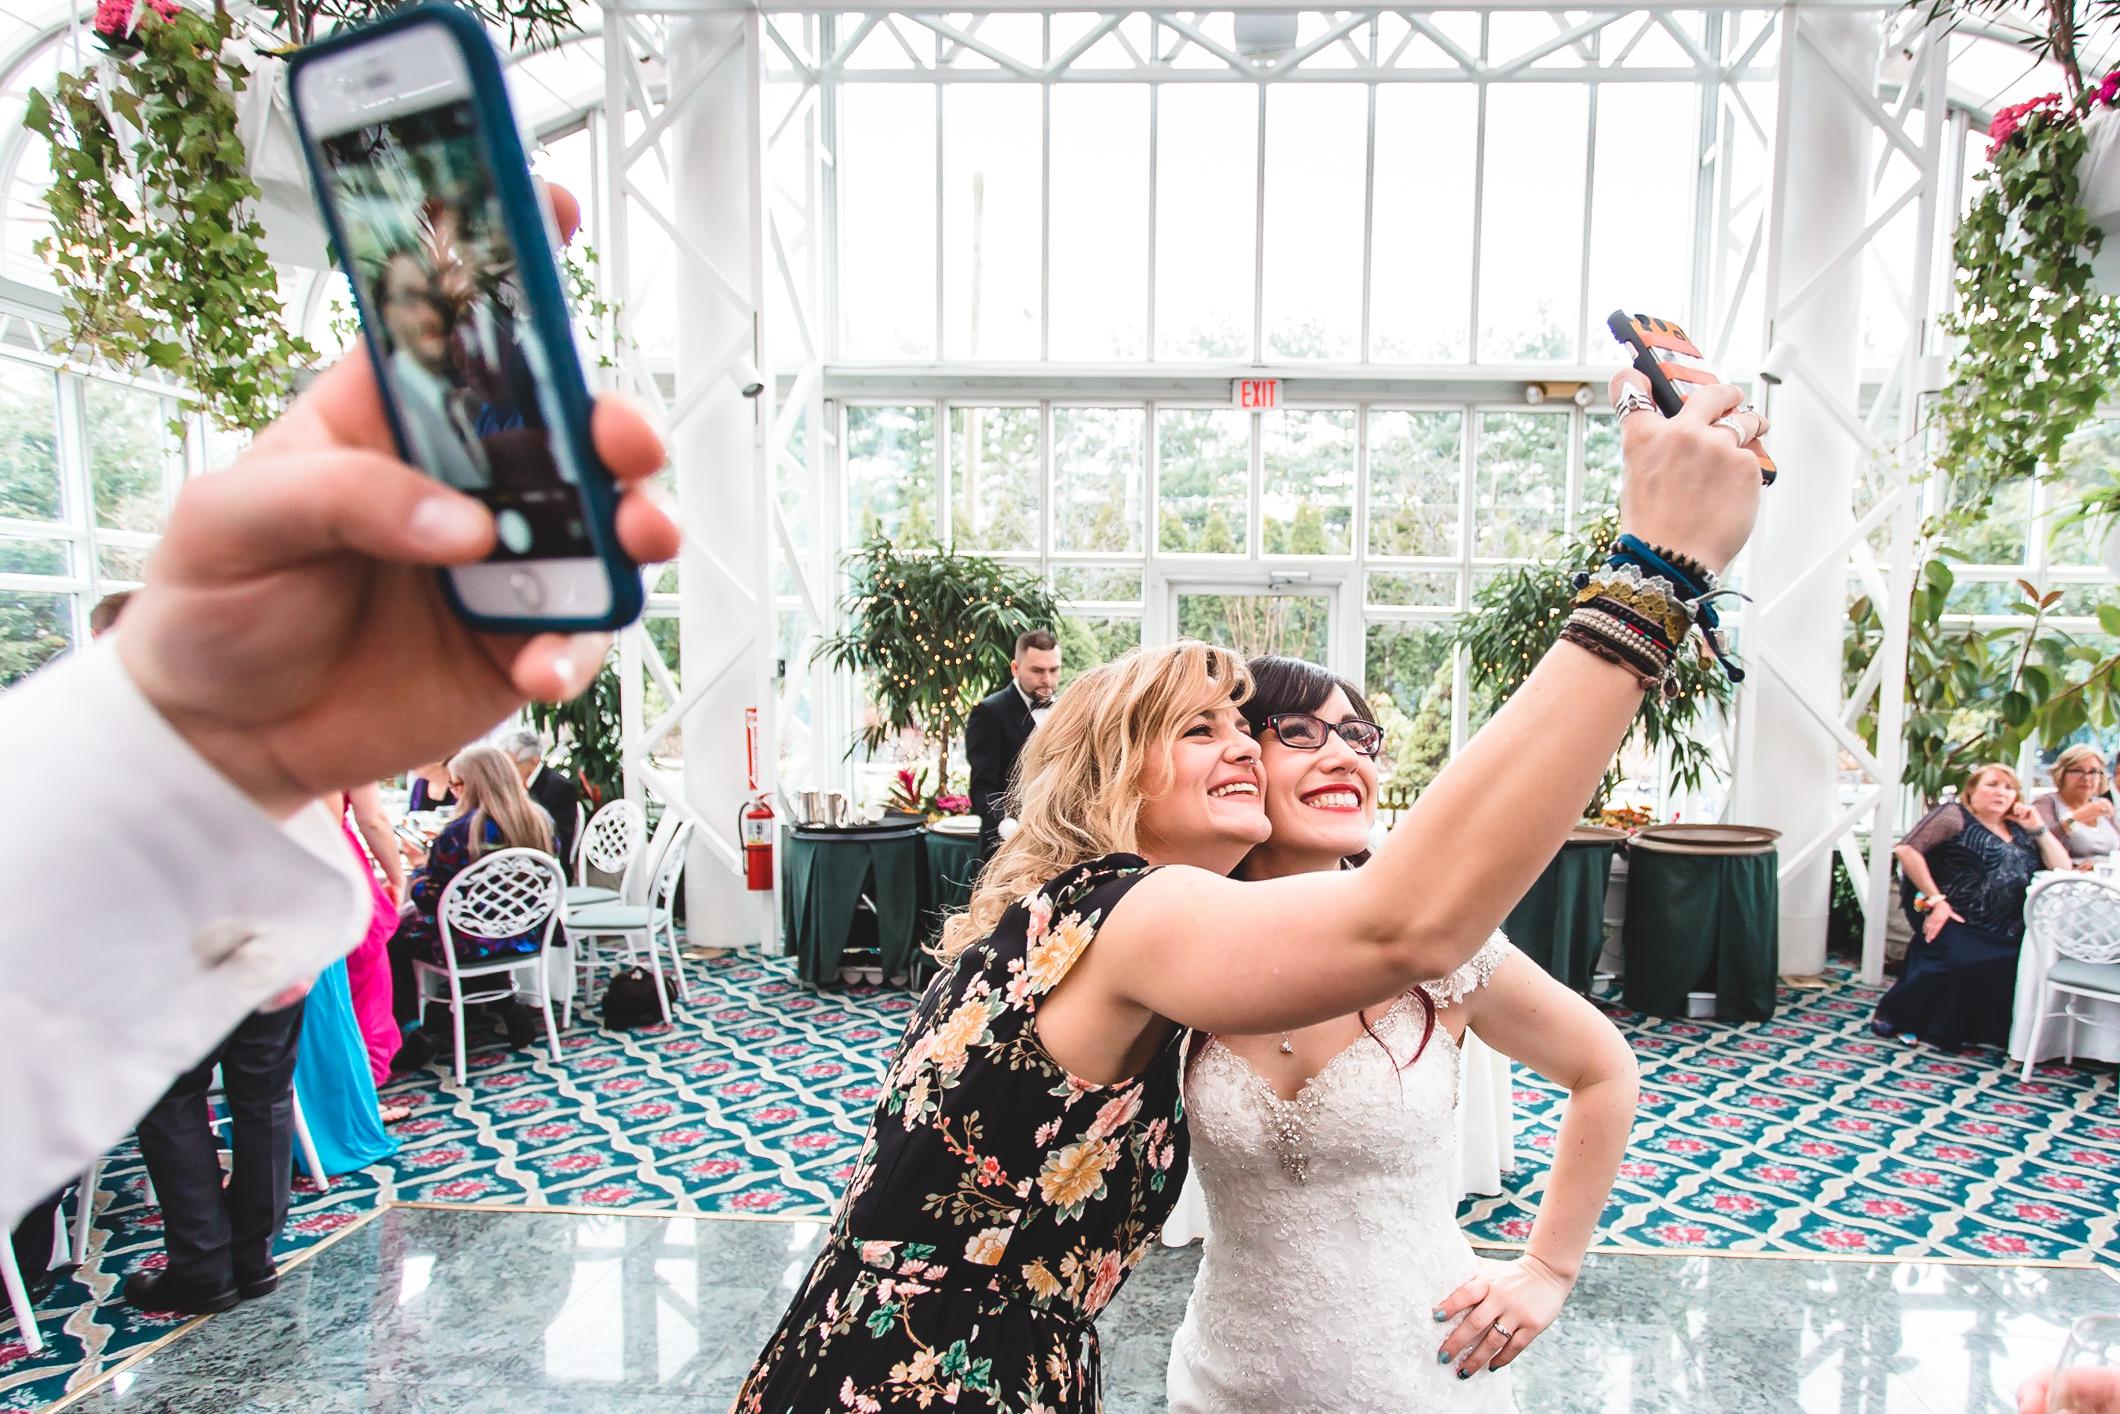 daniel_nydick_nj_photographer_headshot_wedding_event_family-42.jpg